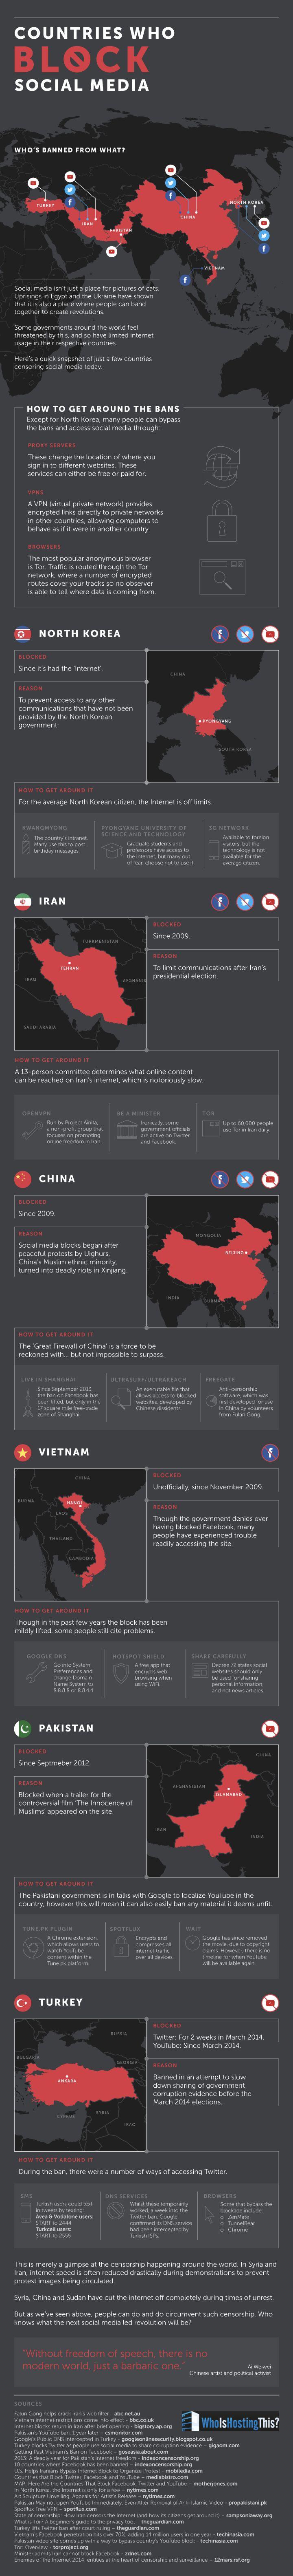 North Korea, Iran, China, Pakistan, Turkey - Countries Who Block Social Media [INFOGRAPHIC] Check this out guys. These are countries who banned social media that distribution from America #DDWSU